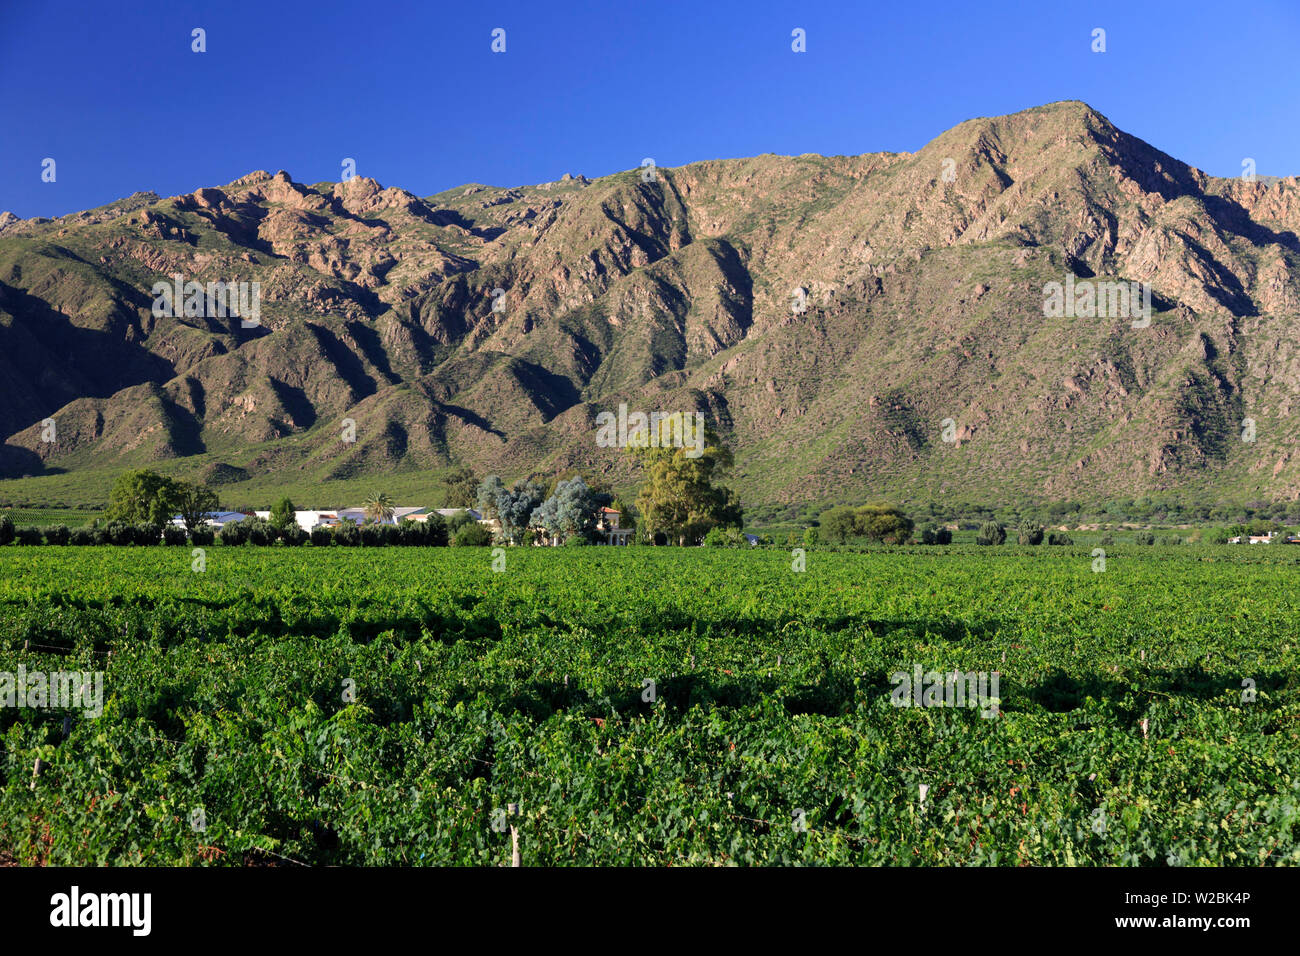 Argentina, Salta, Cafayate, Torrontes Grape Wineries - Stock Image